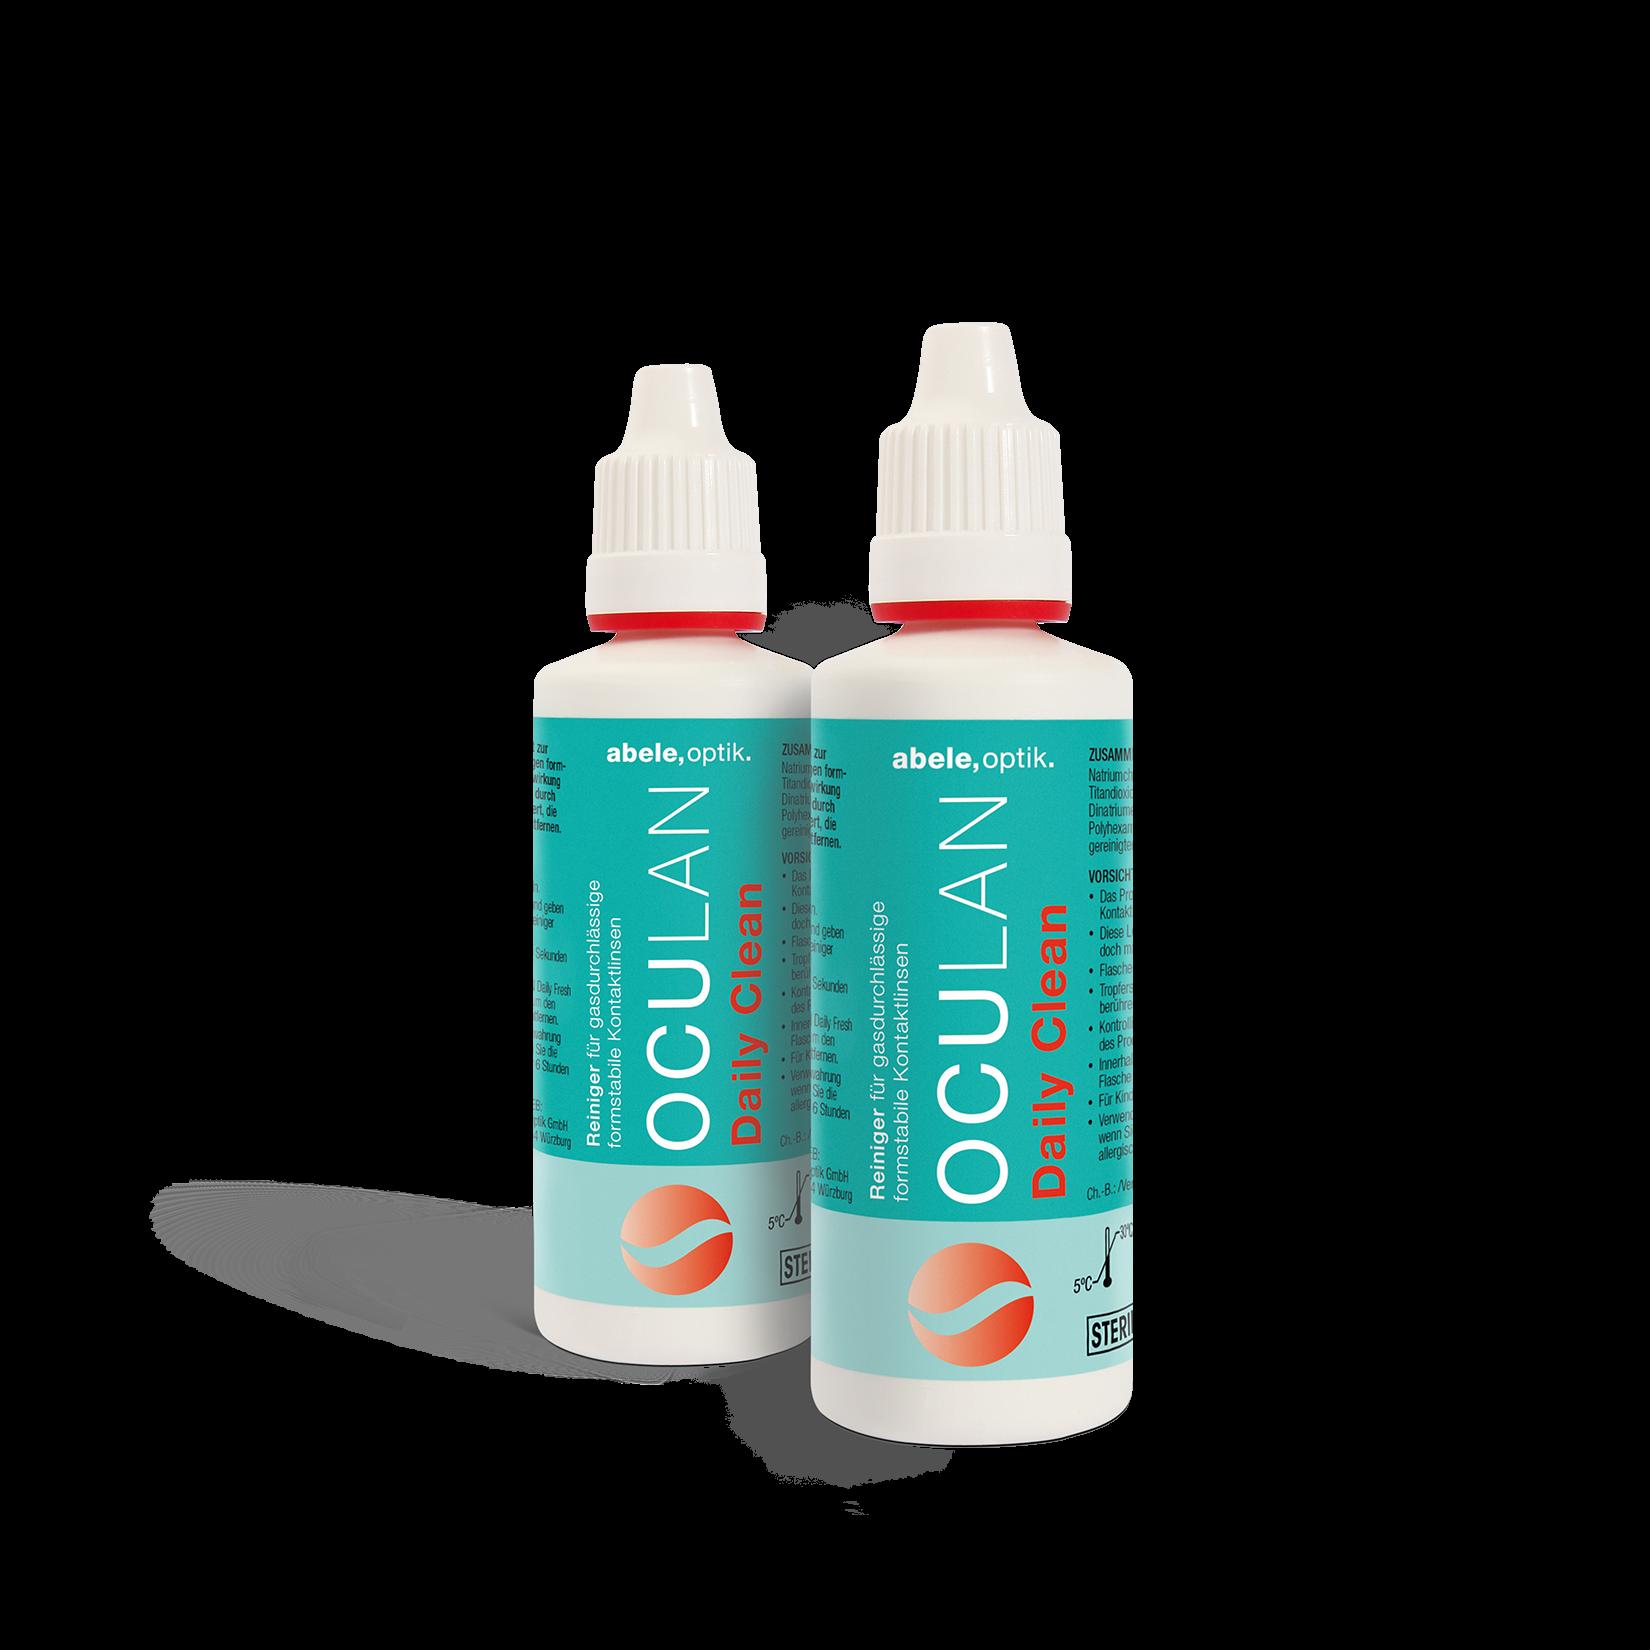 Oculan Daily Clean Sparpack, Abele Optik (2 x 30 ml)